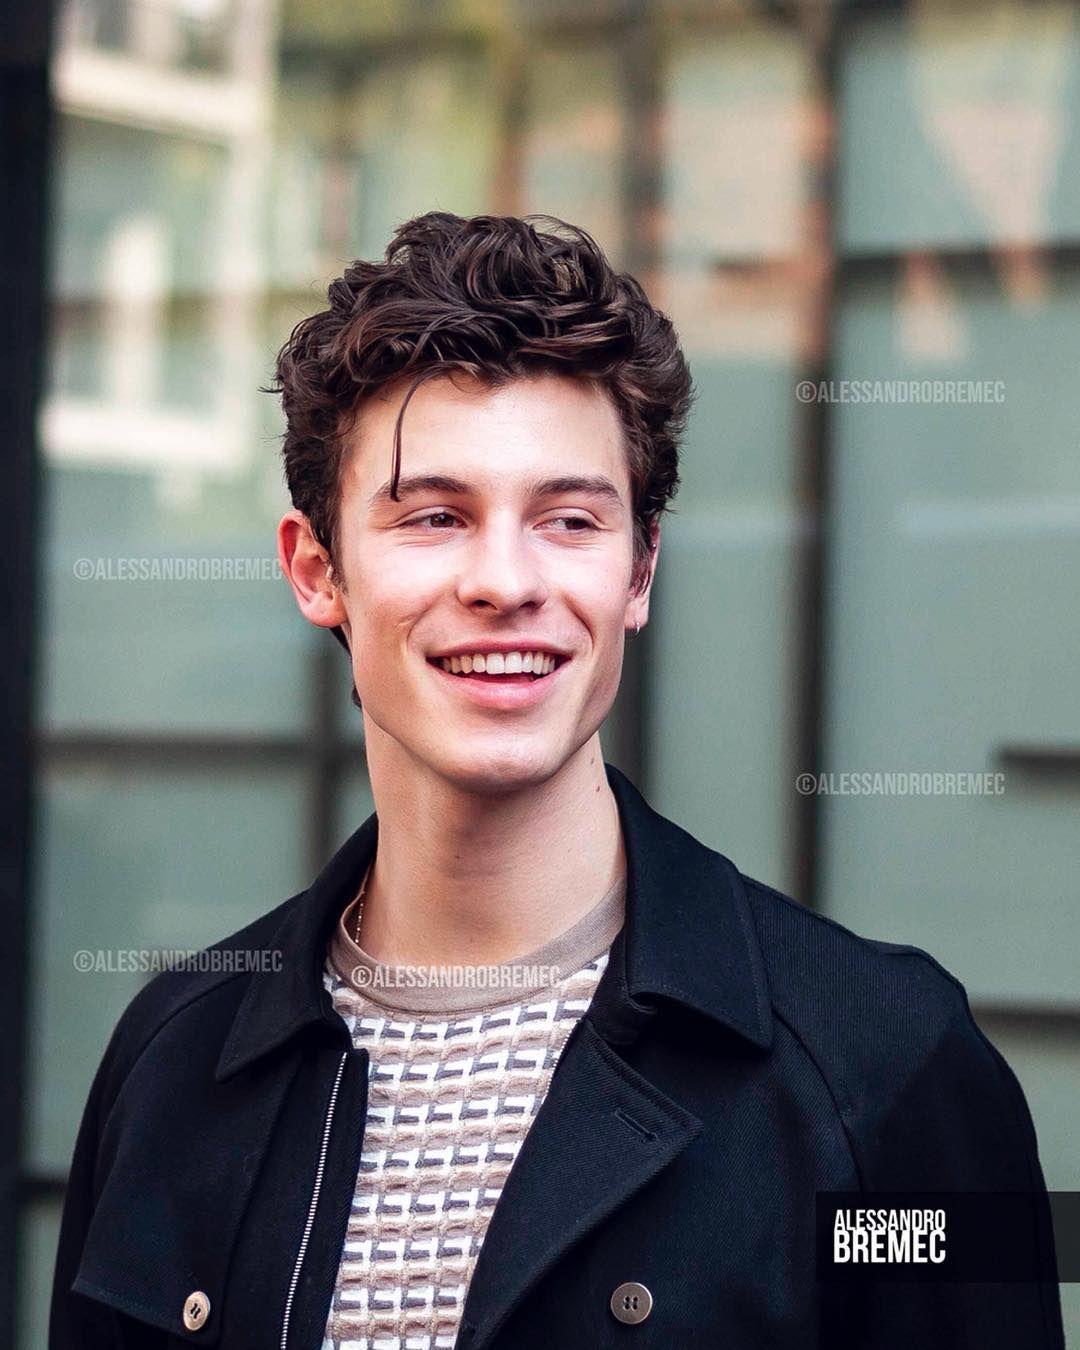 Shawn Mendes Handwritten Meet Greet Emporio Armani Store Milano 24 03 2019 Shawnmendes By Alessandrobremec C Alessa Shawn Shawn Mendes Mendes